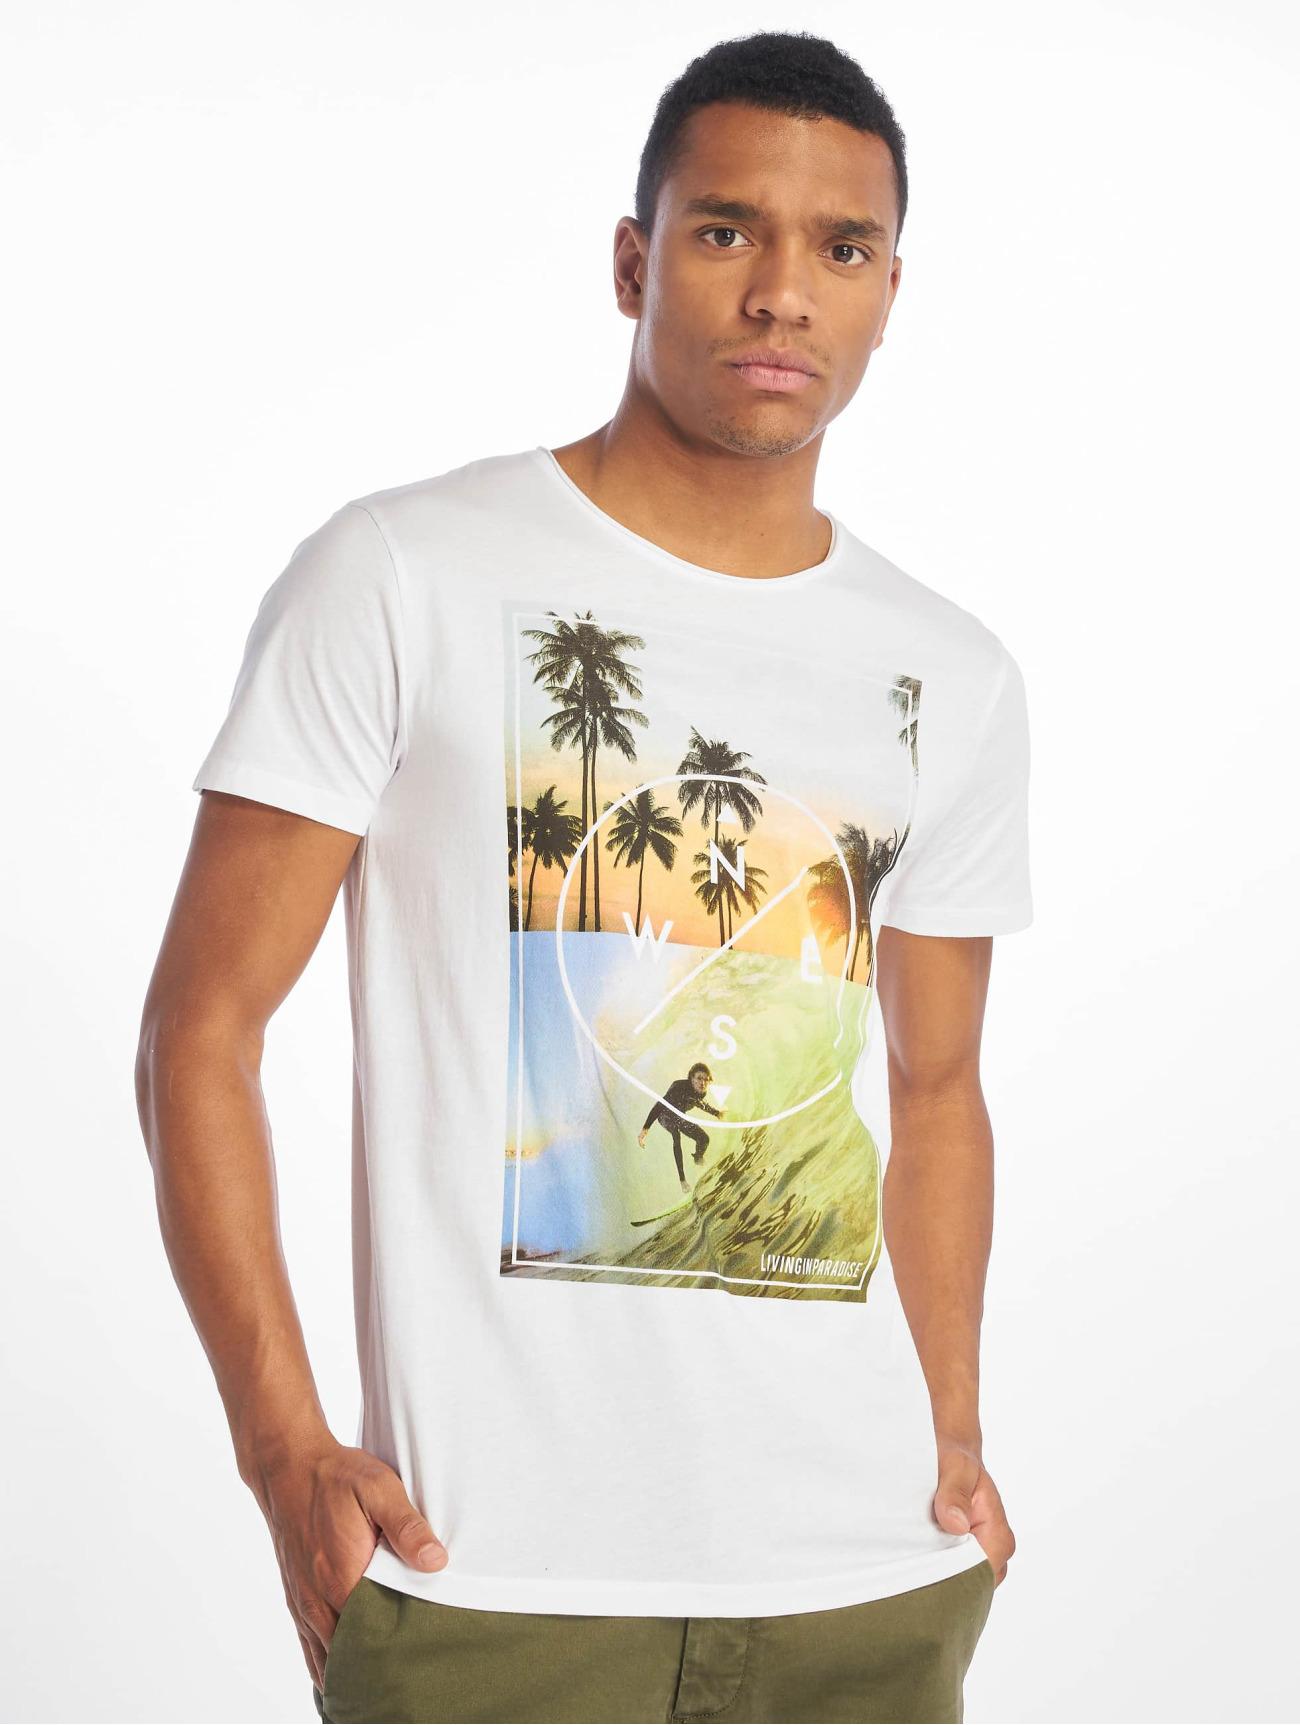 Stitch & Soul Överdel / T-shirt Living Paradise i vit 673058 Män Överdelar